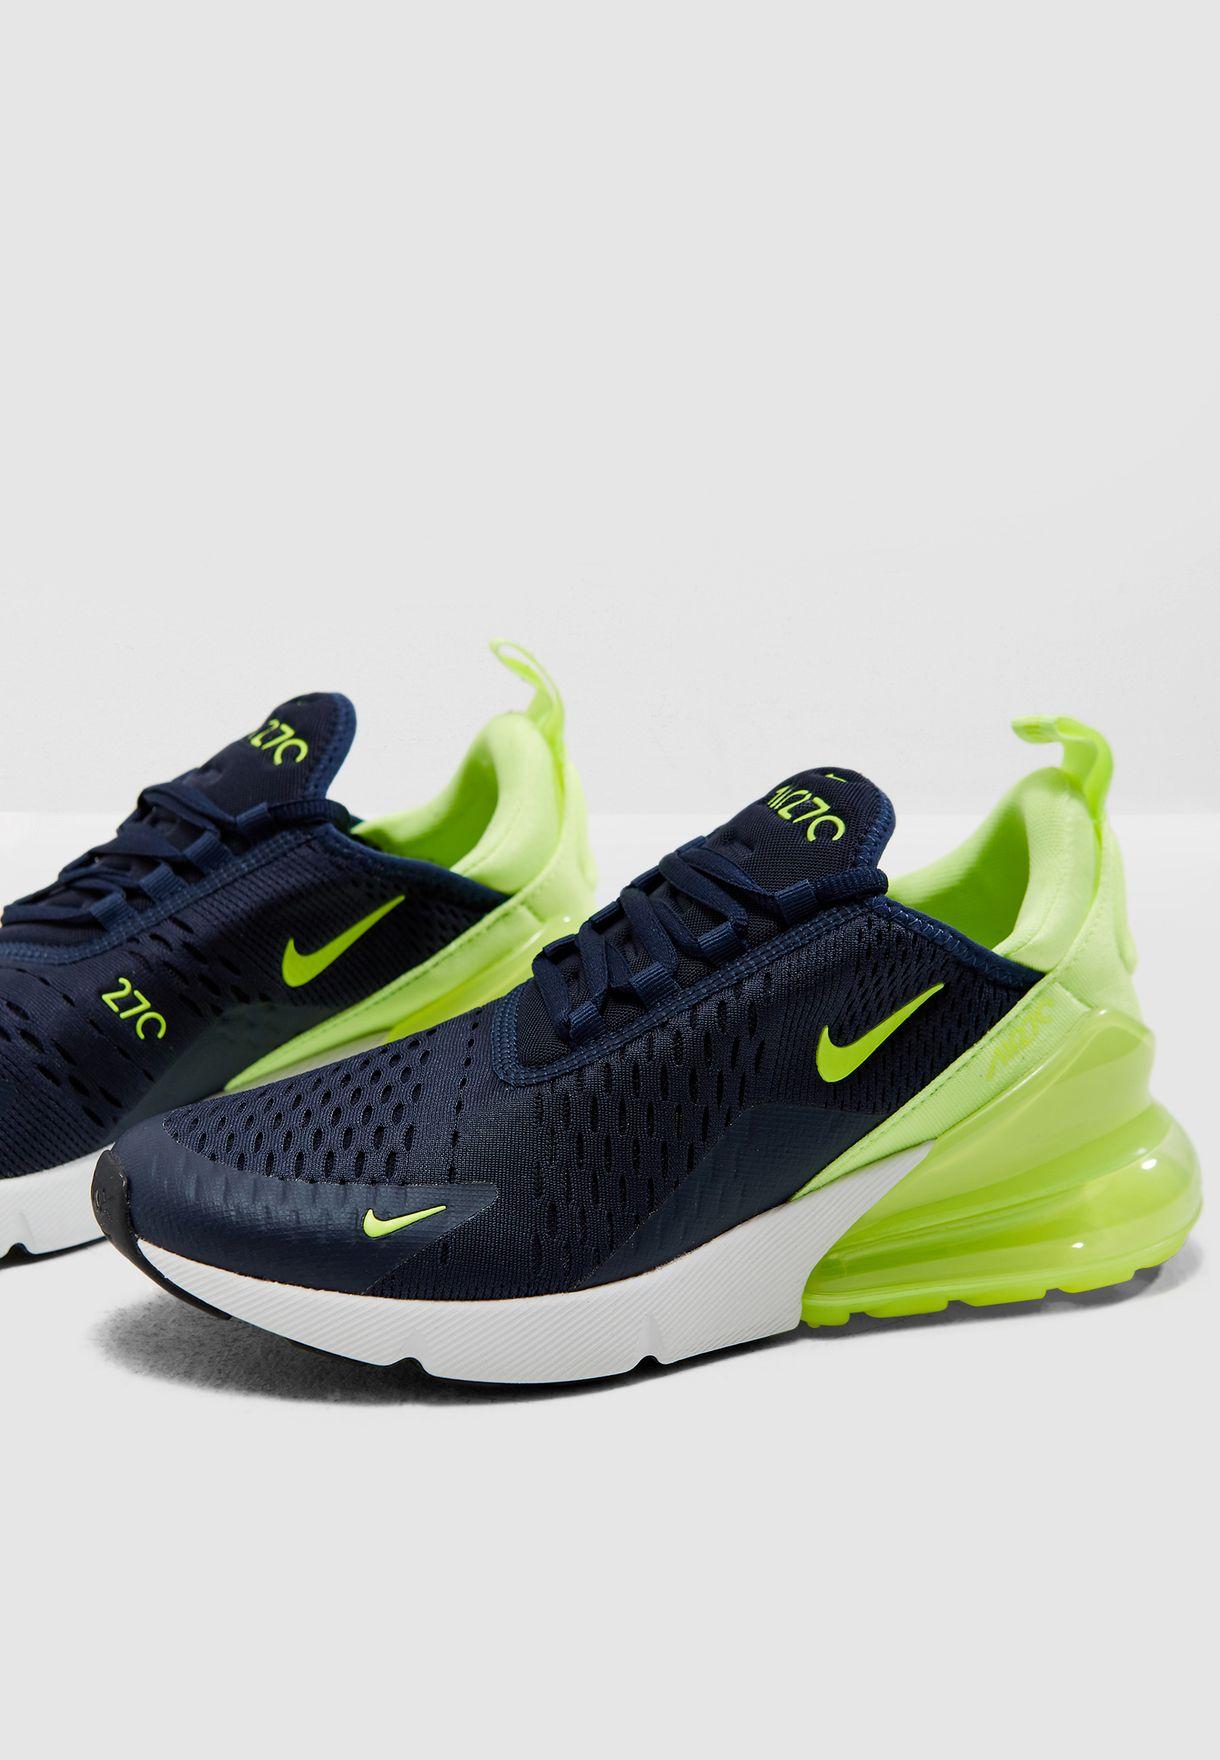 d6a56e846863d Shop Nike multicolor Air Max 270 AH6789-401 for Women in UAE ...